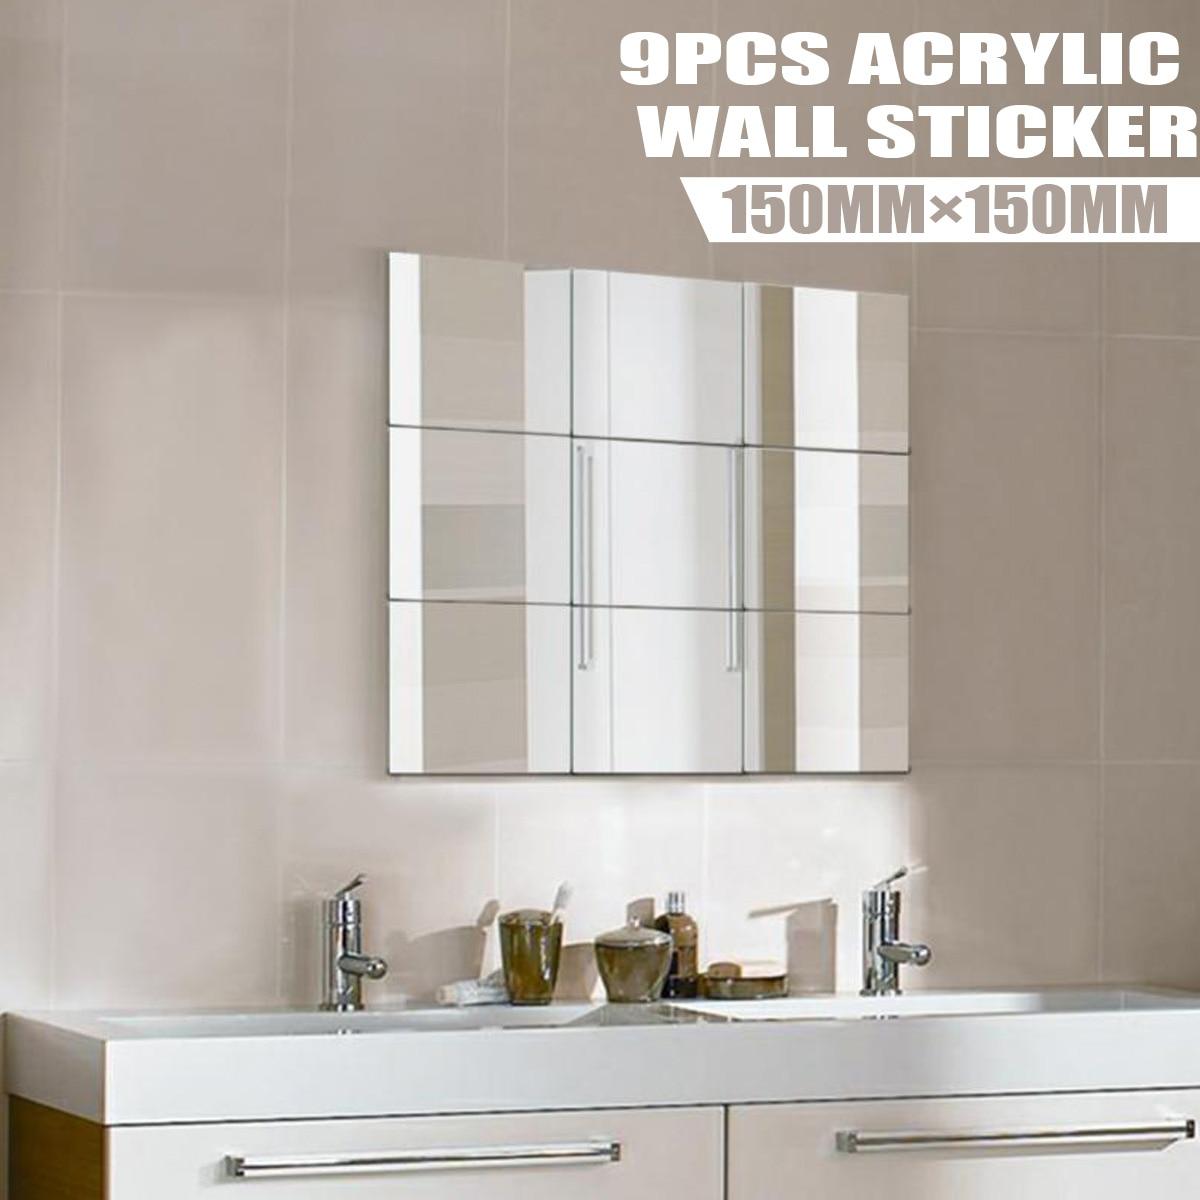 60x100CM Self Adhesive Film Wall Foil Mirror Sticker DIY Reflective Art Decals